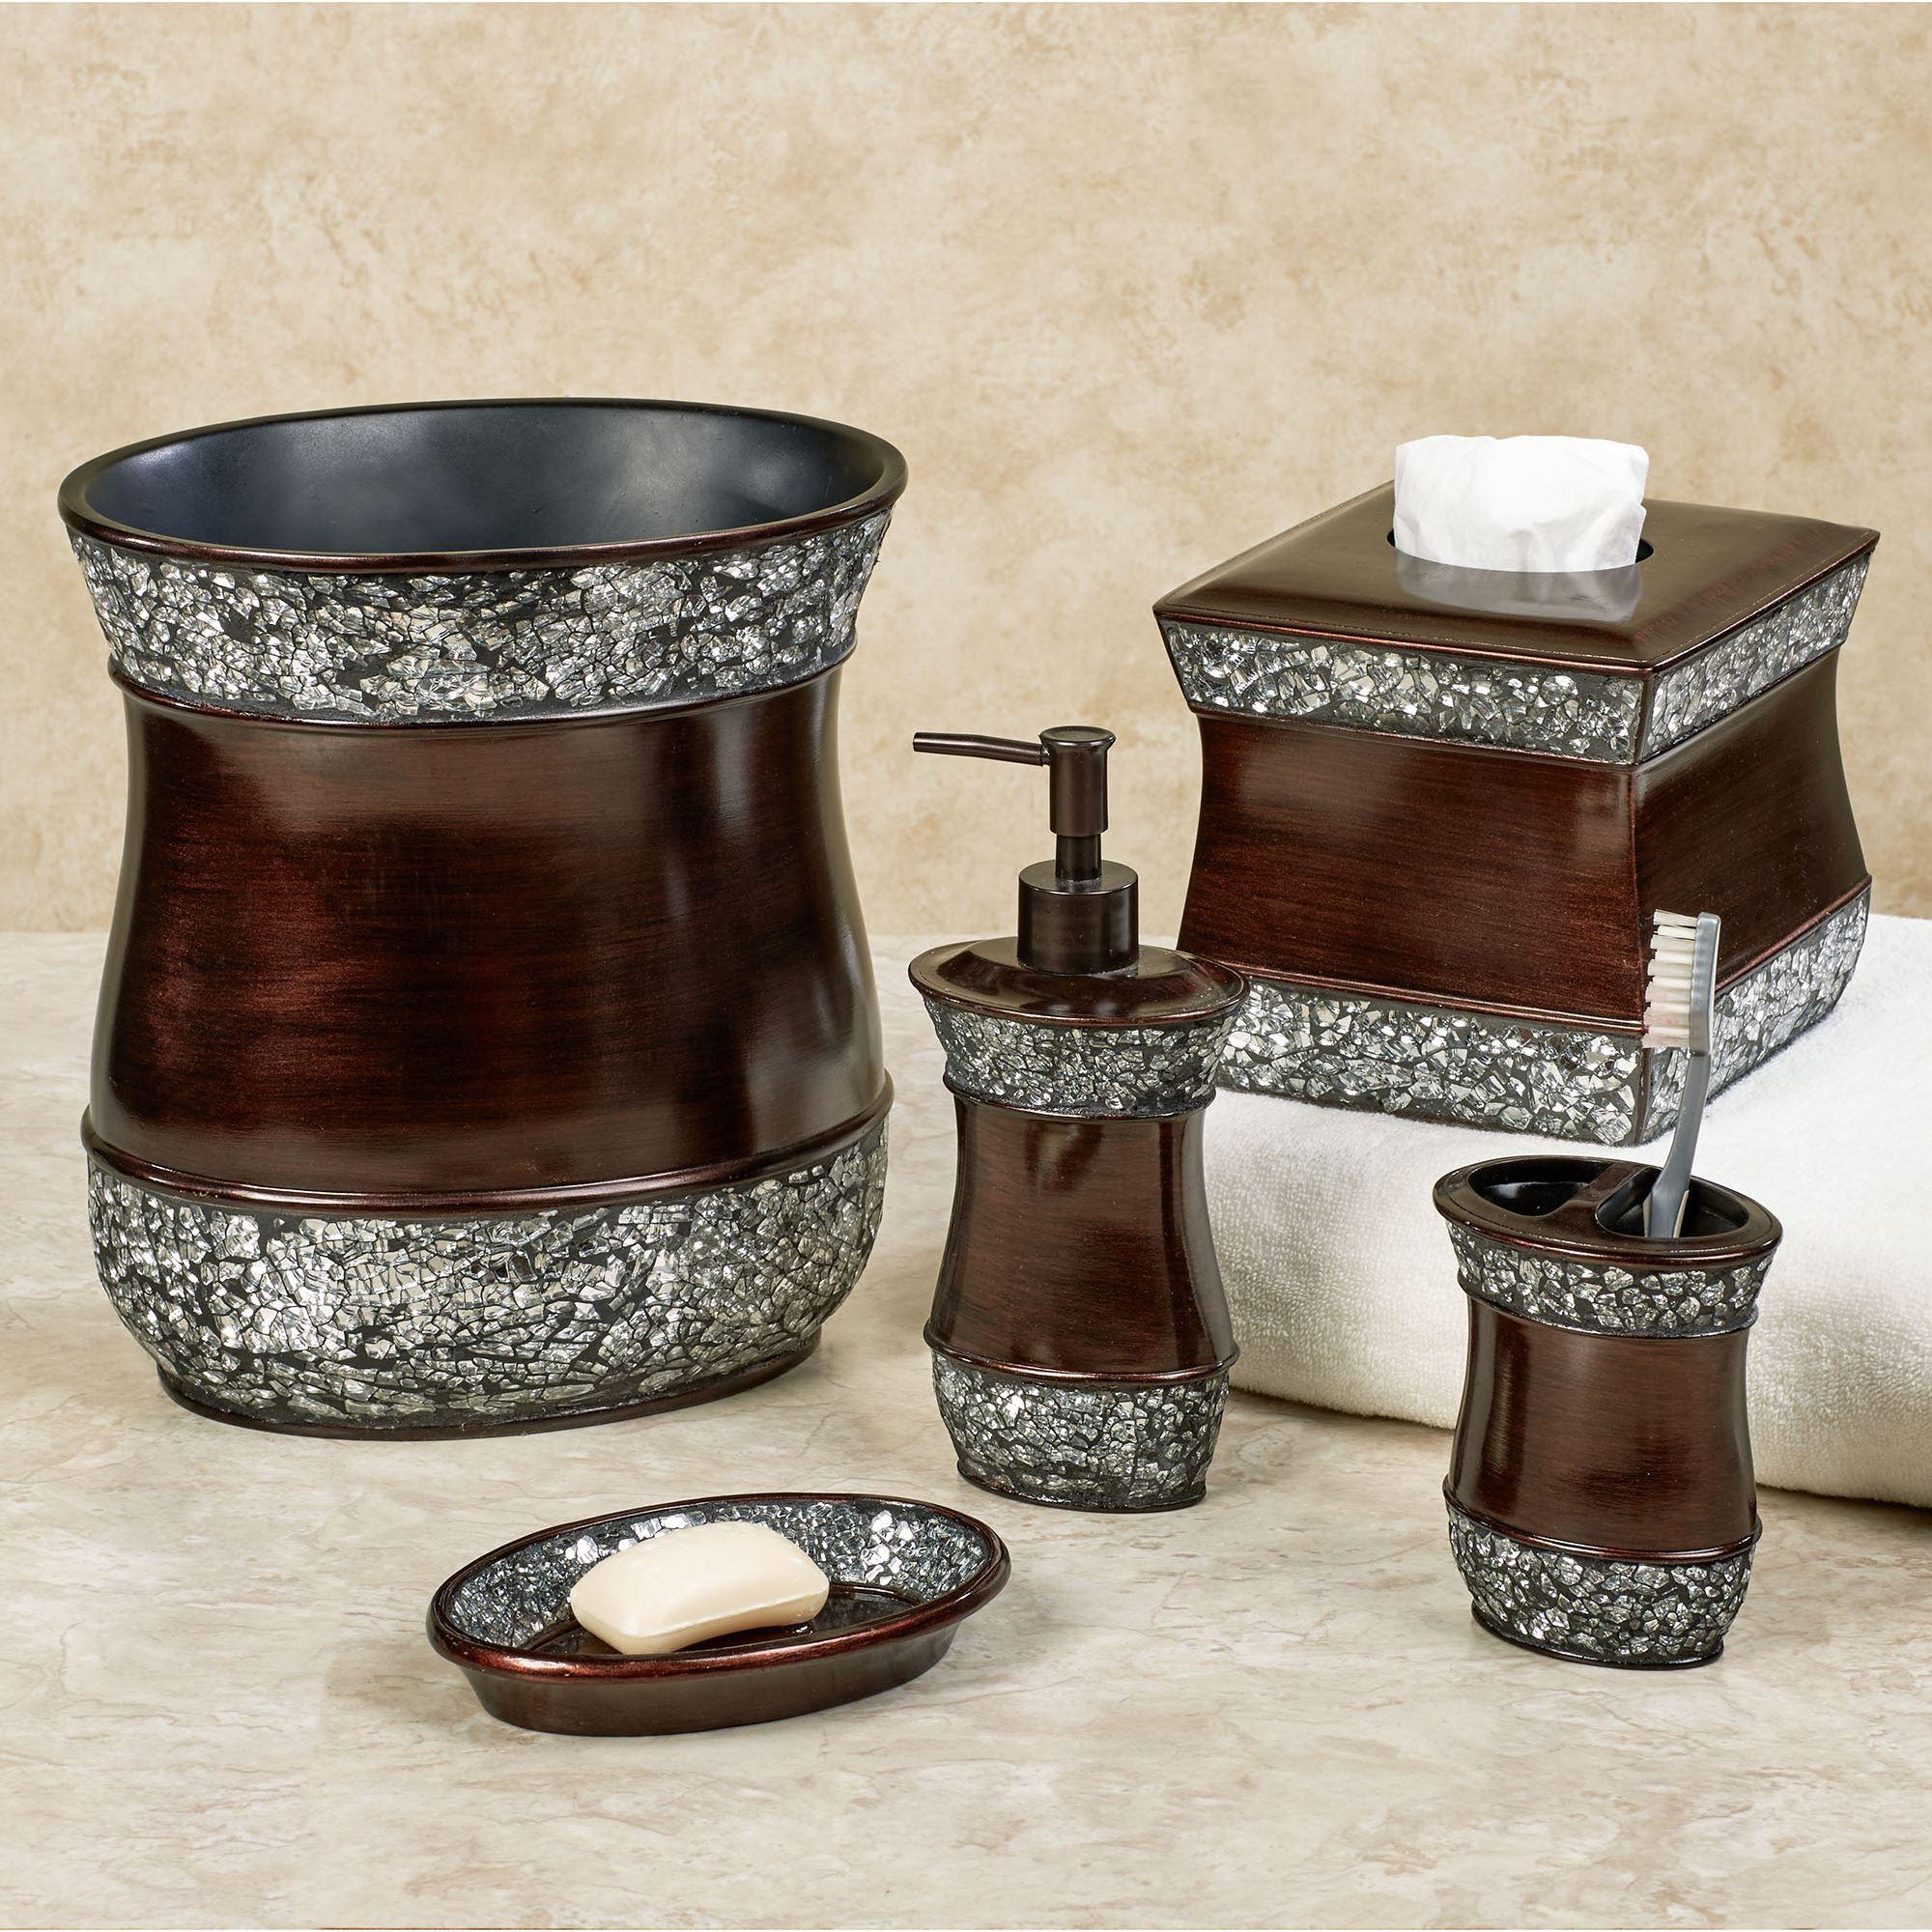 Elite Handpainted Bath Accessories, Bathroom Accessories Bronze